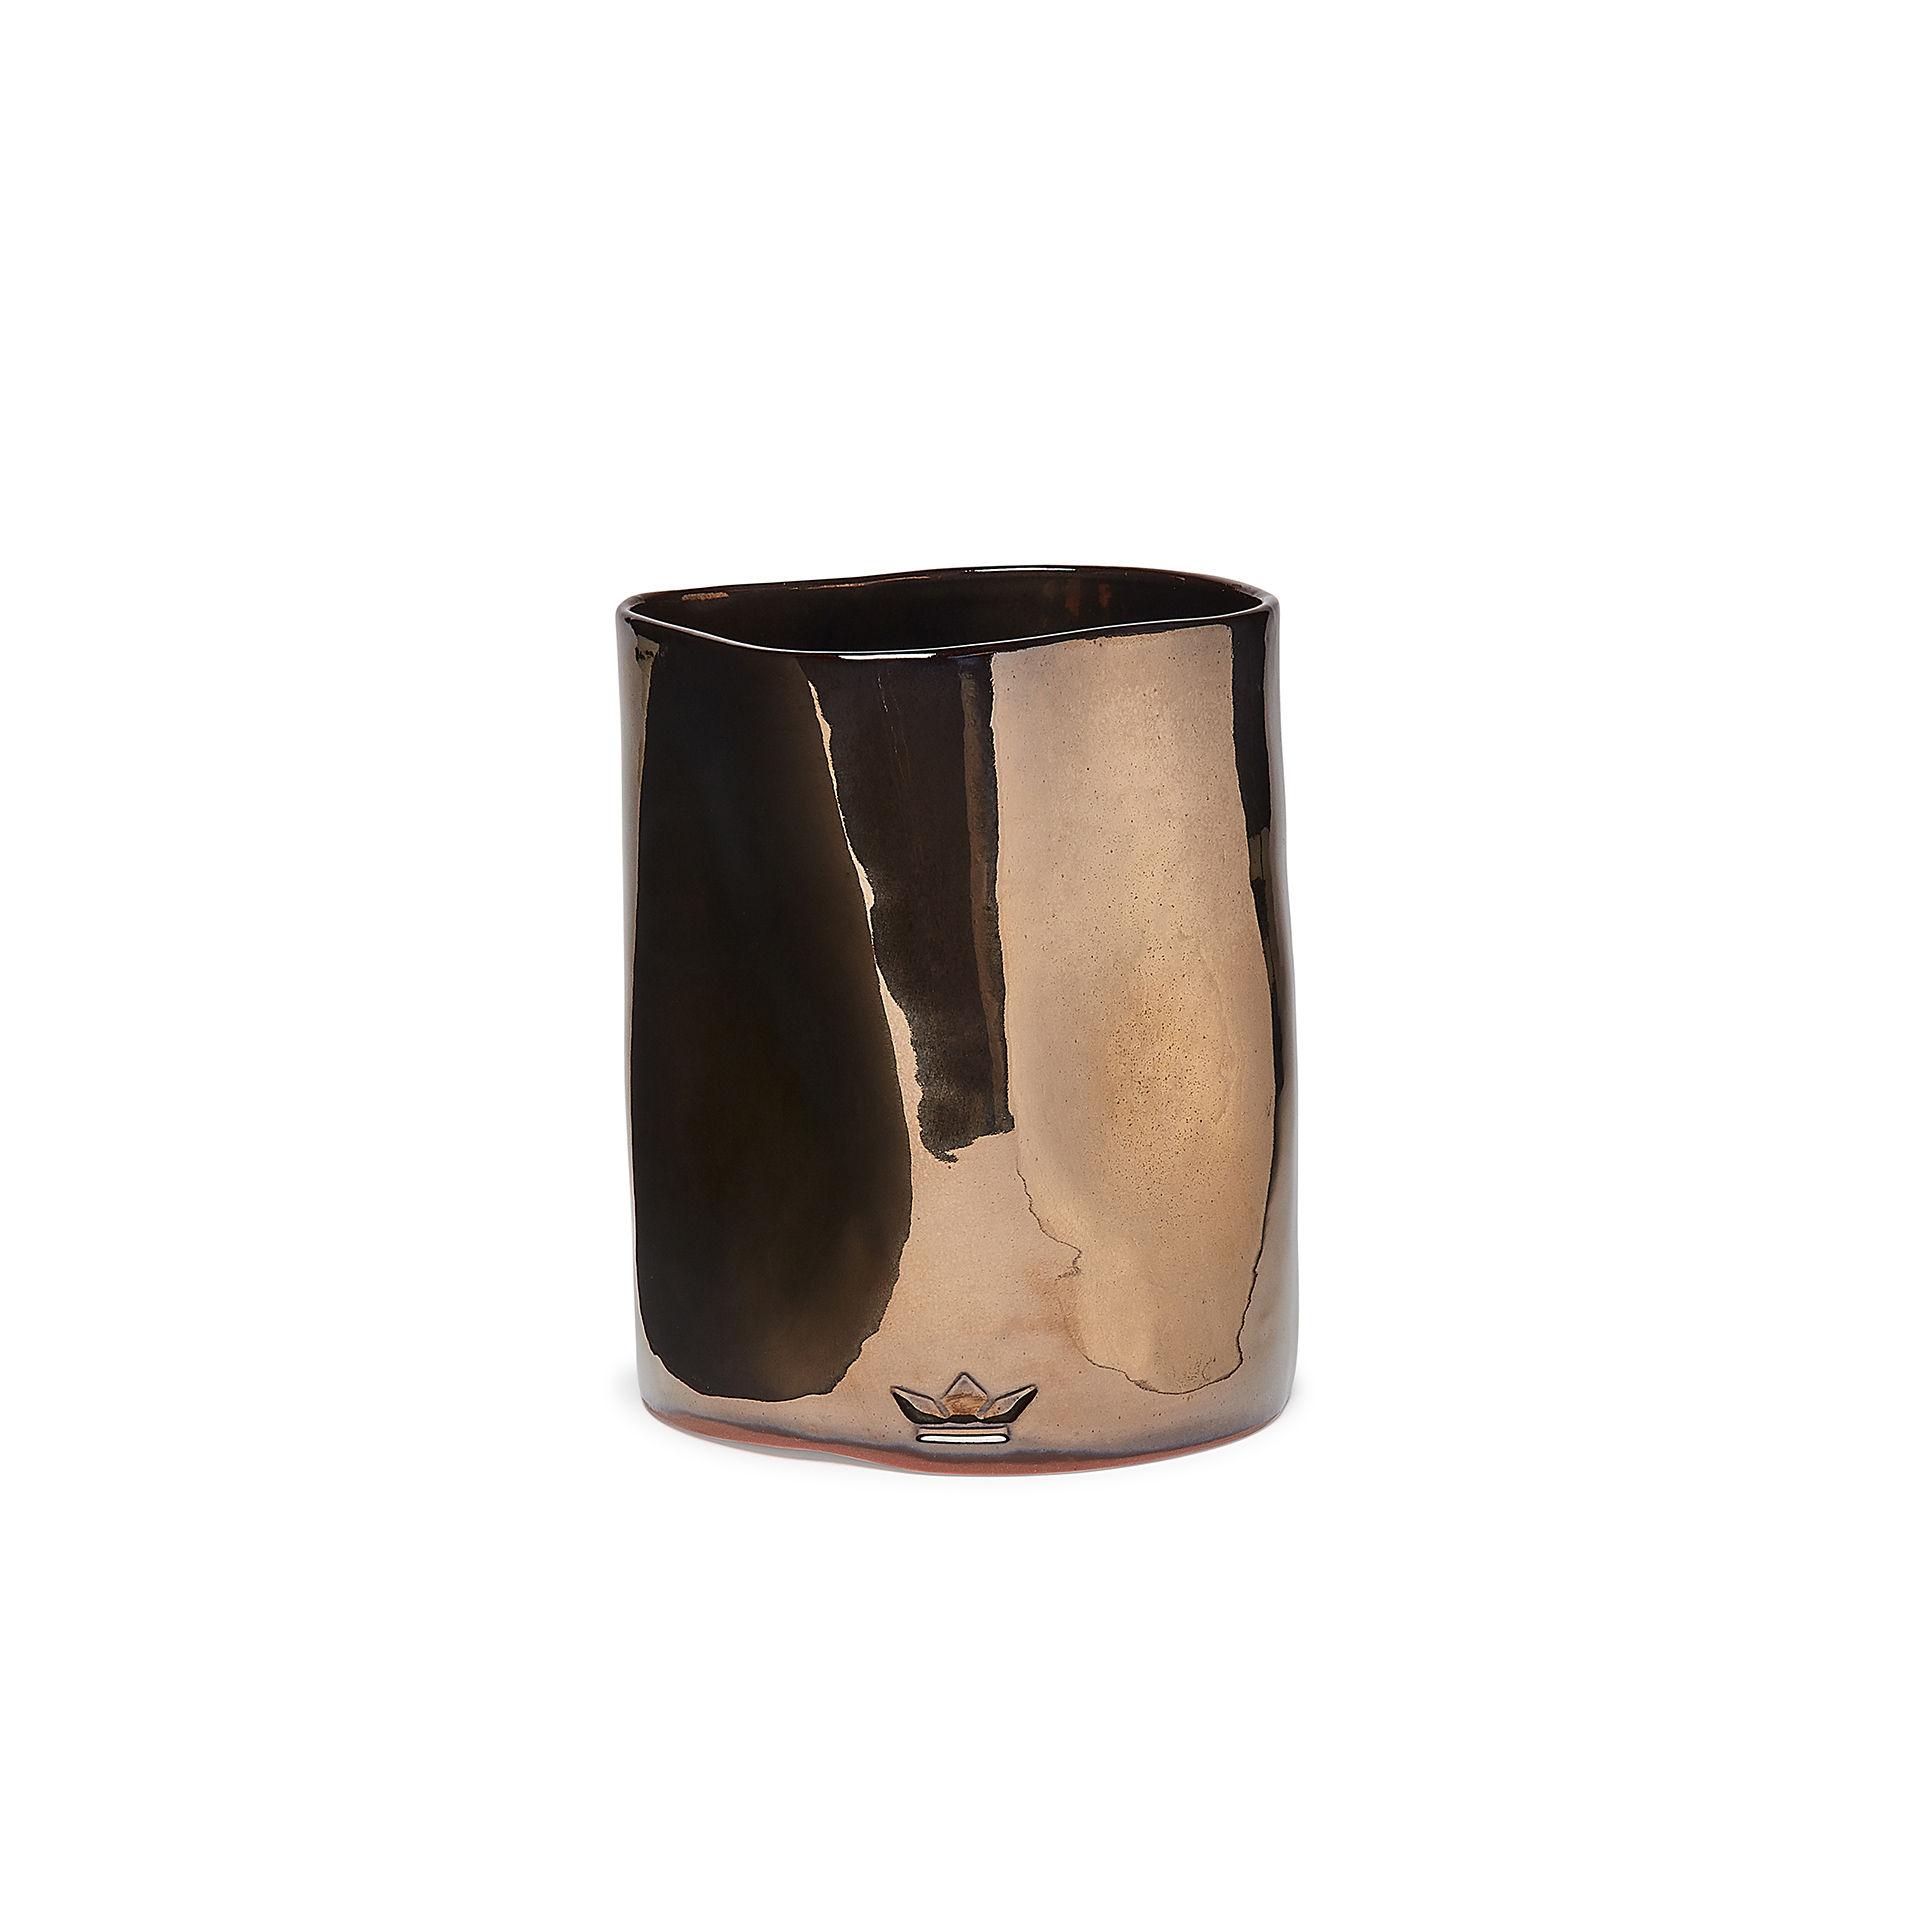 Decoration - Vases - Bosselé Utensils pot - / Vase - Ø 14.5 x 19 cm - Ceramic by Dutchdeluxes - Shiny platinum - Ceramic